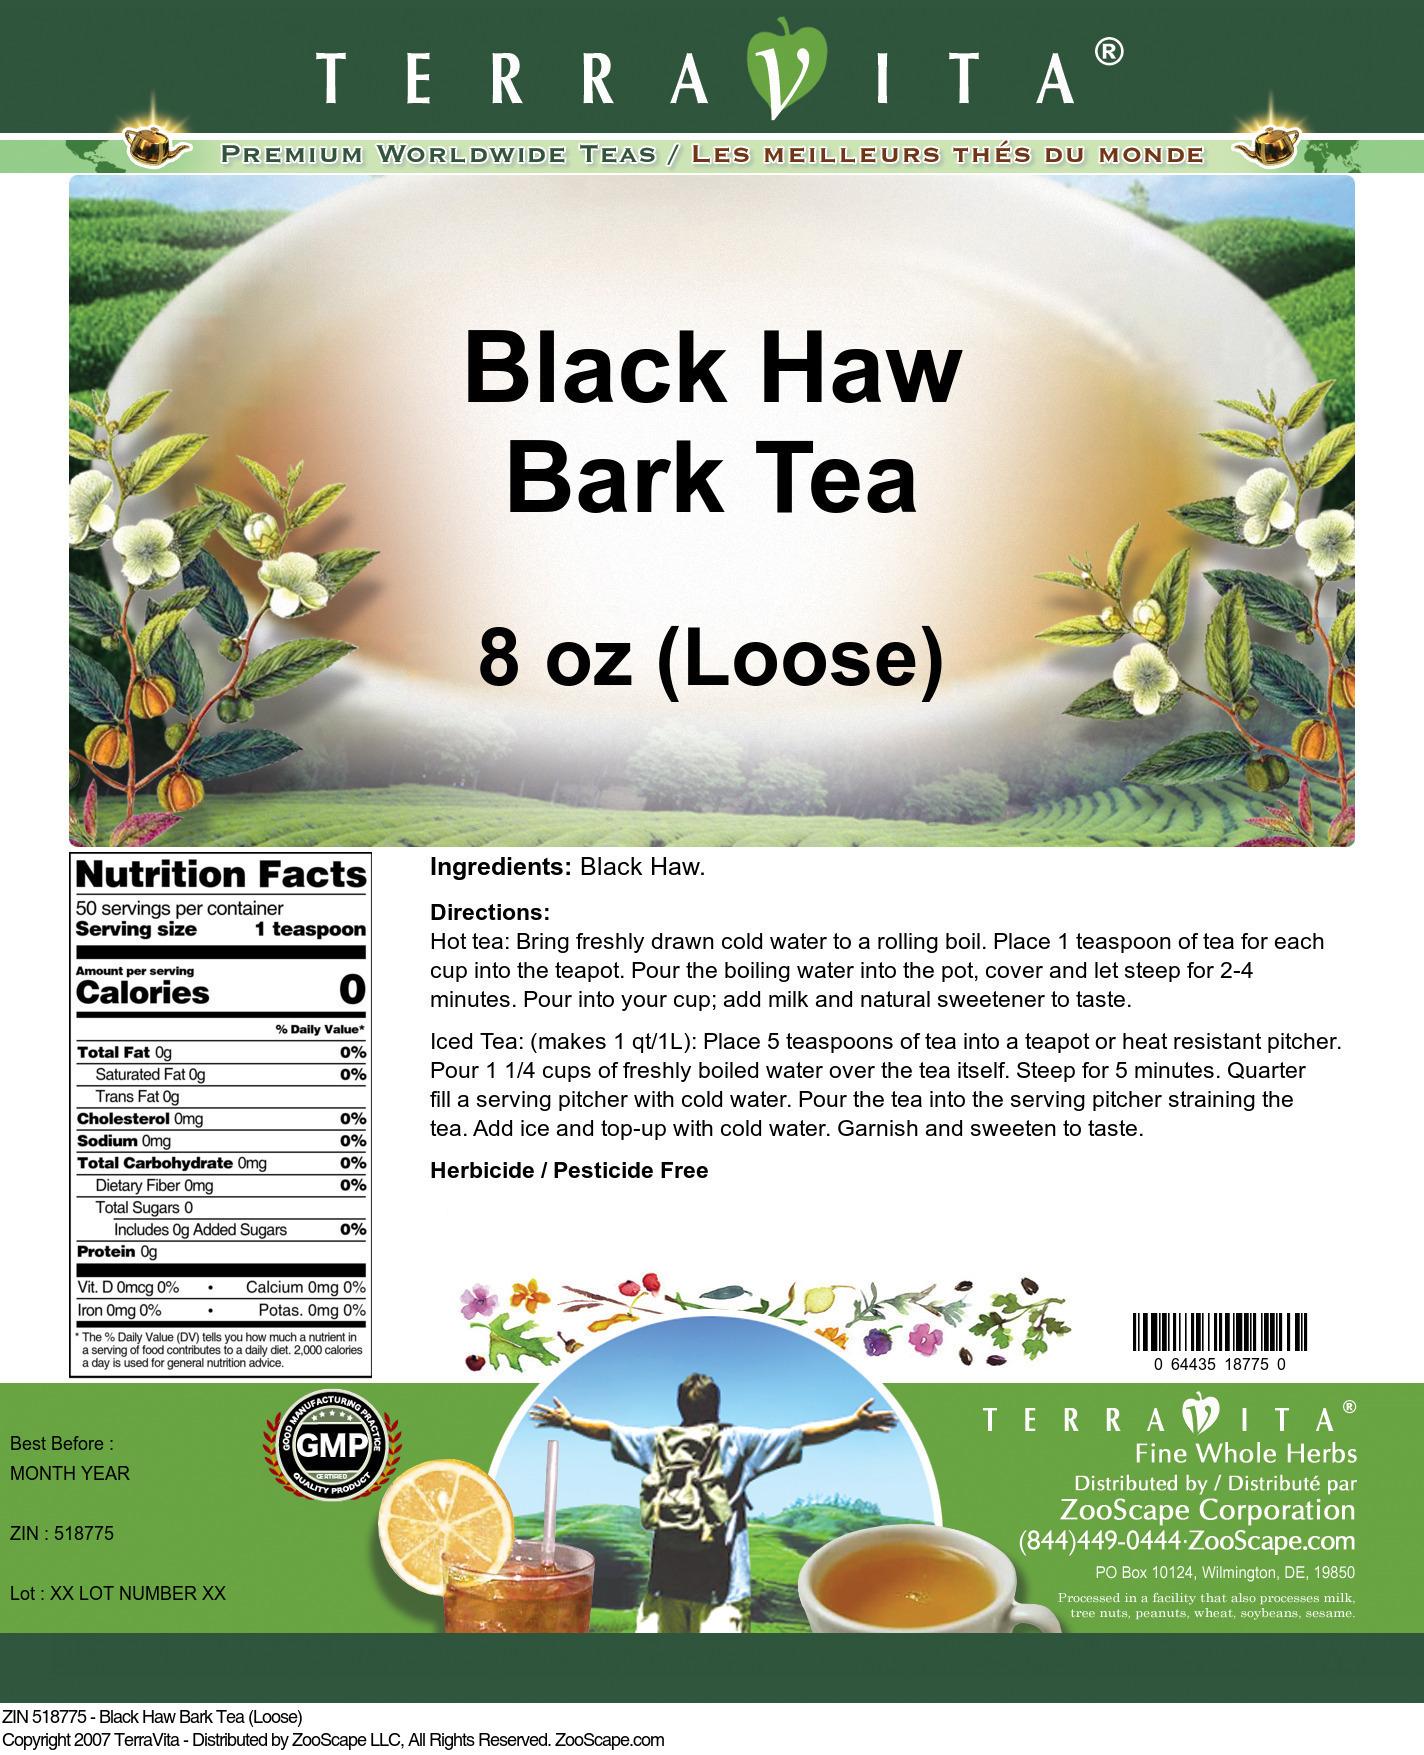 Black Haw Bark Tea (Loose)